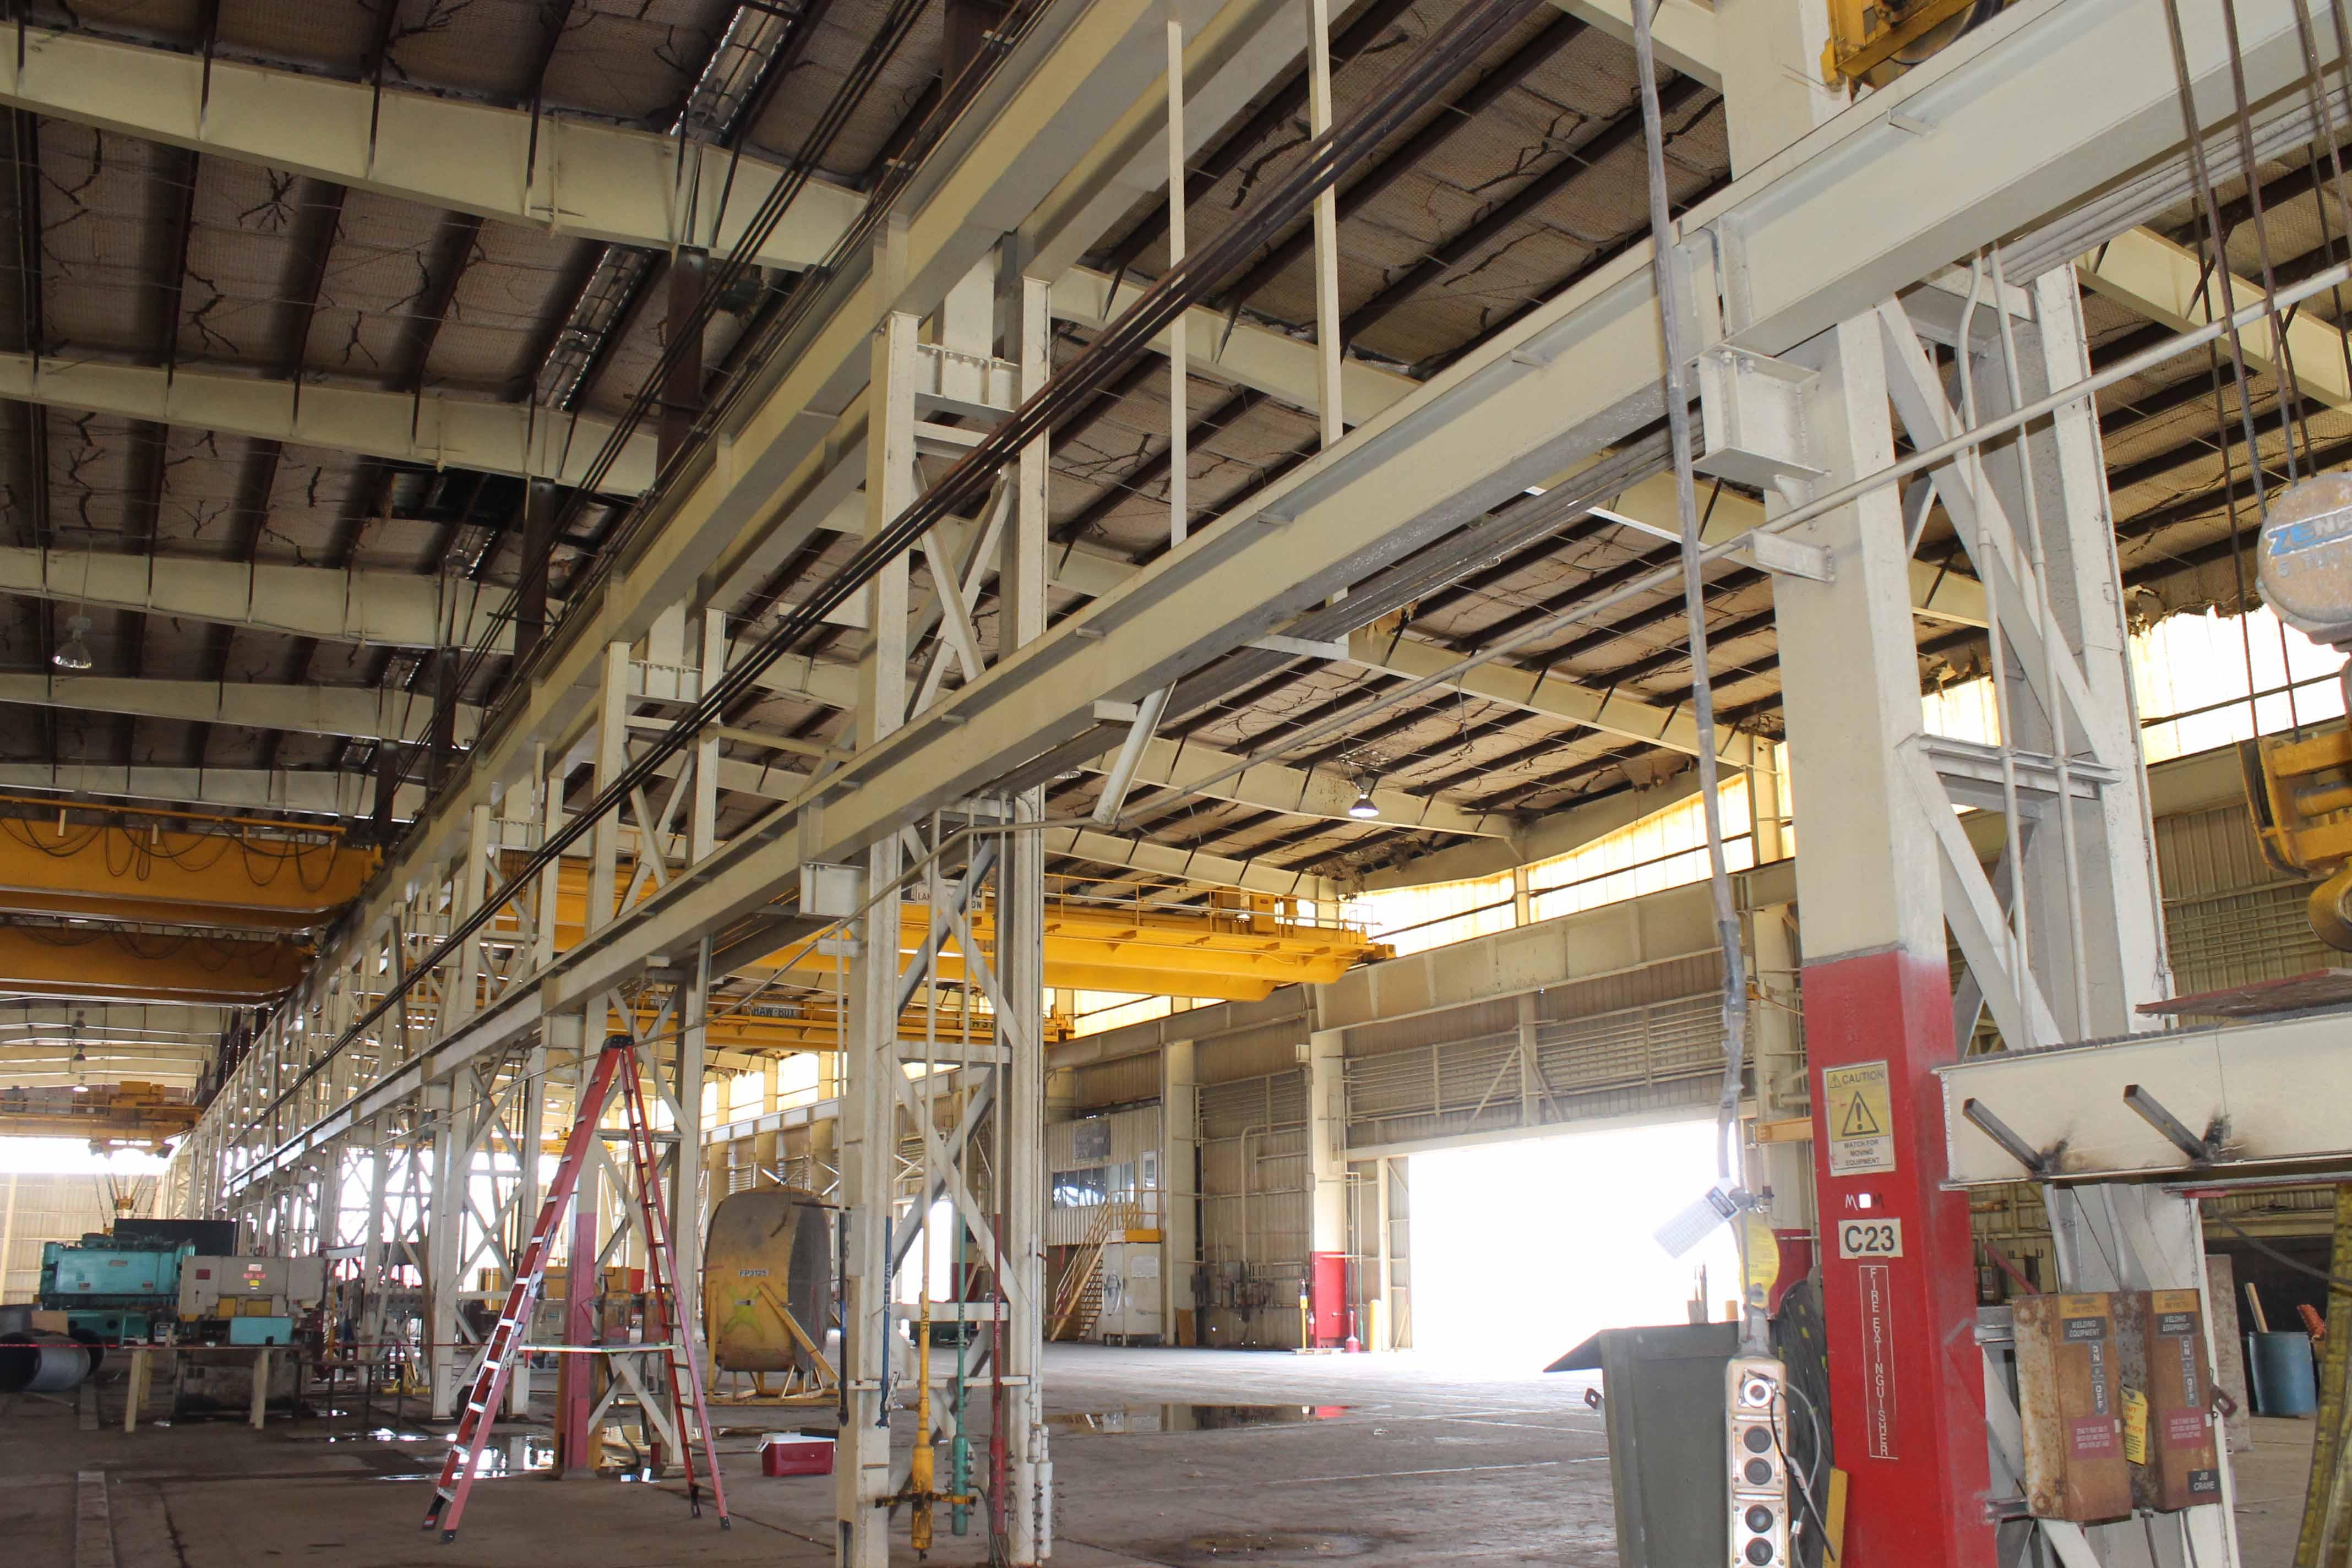 Lot 7 - Dual I-beam OH Crane Runway, approx 700' , w/rail, (Location: Fab Shop - South Bay)